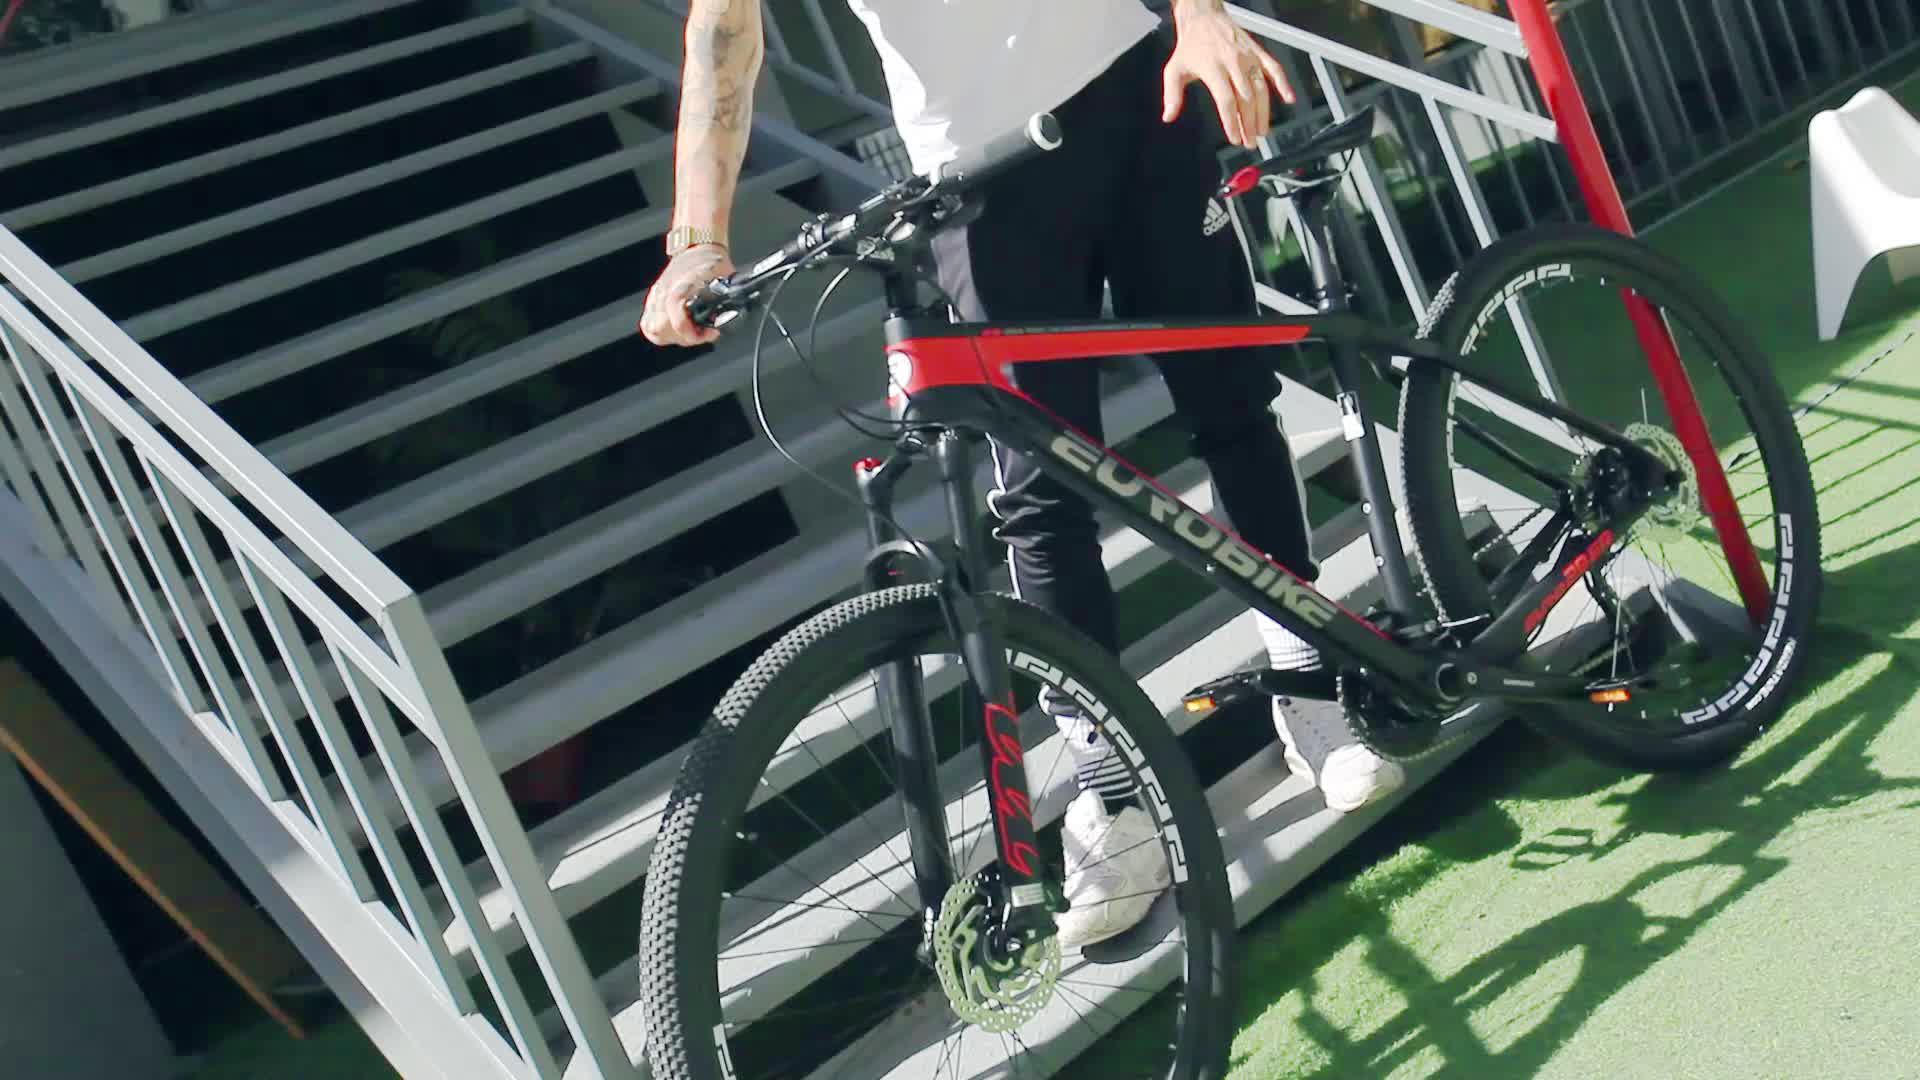 EUROBIKE 2019 Top Selling 700C Alloy Road Racing Bike XC7000 16 Speed Road Bike 60mm Rim/ Cycling / Road Bicycle Made in China